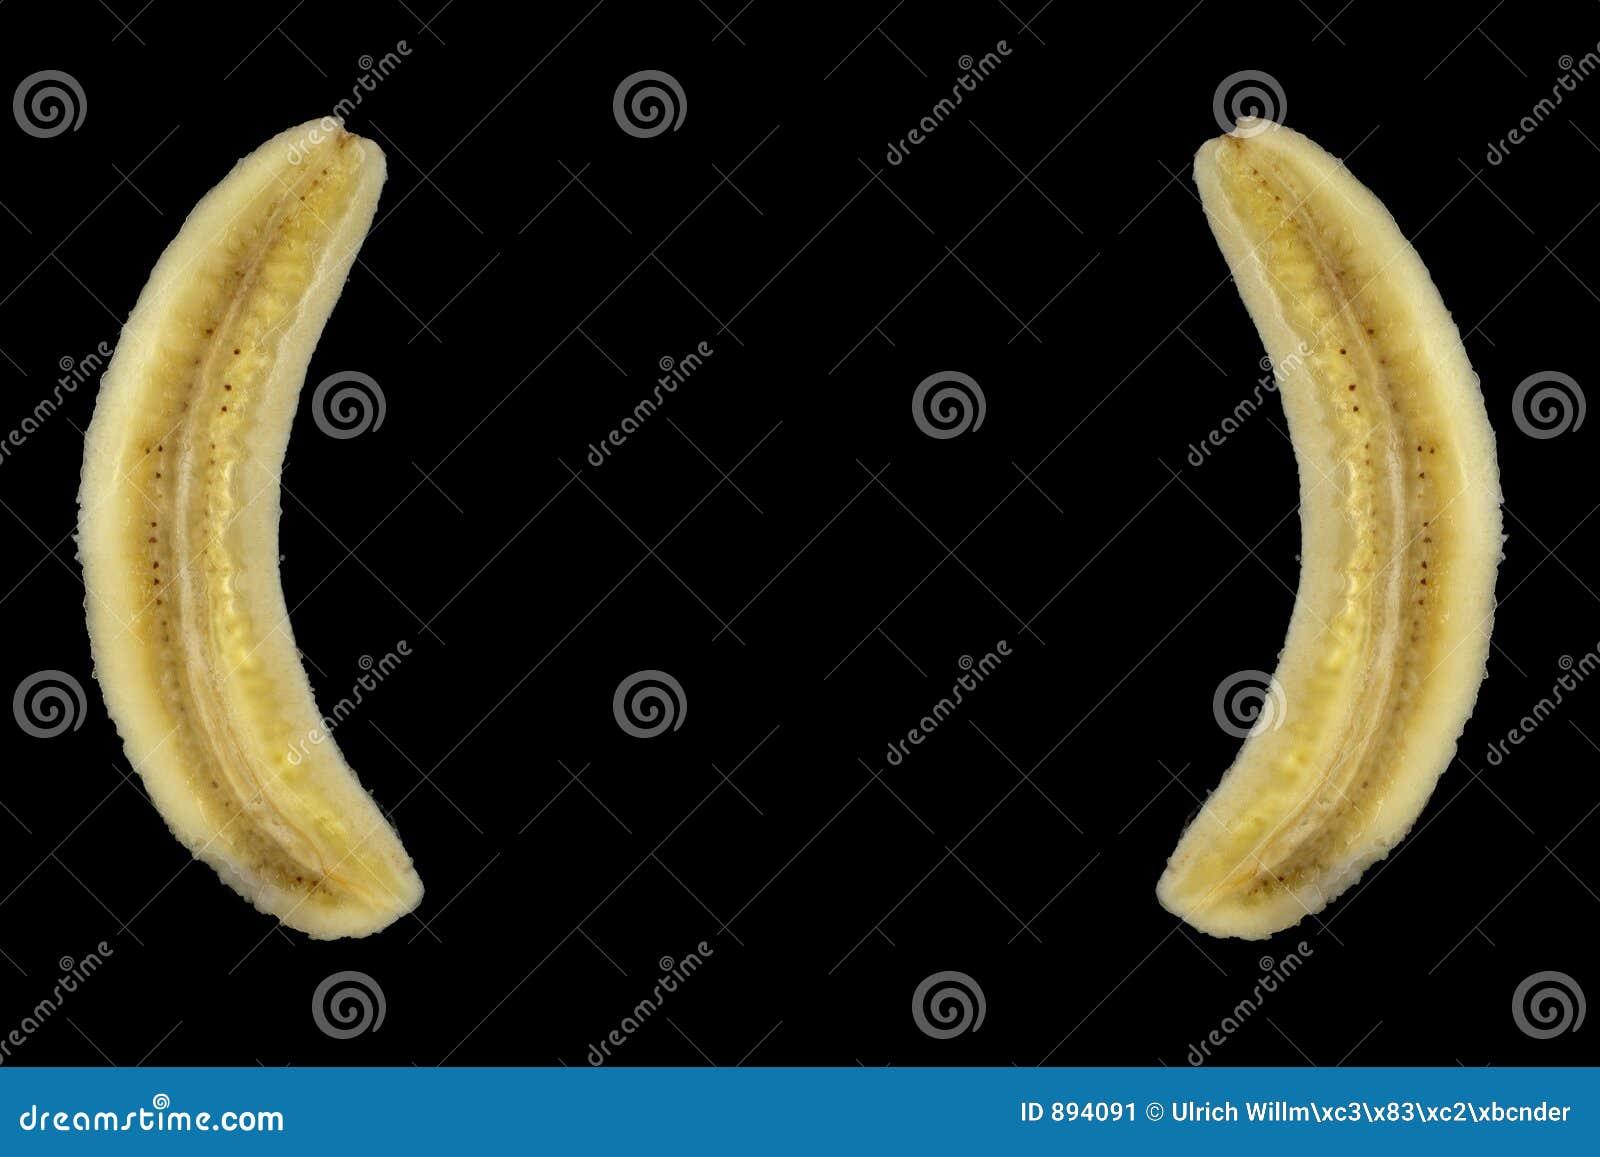 Bananen klammer